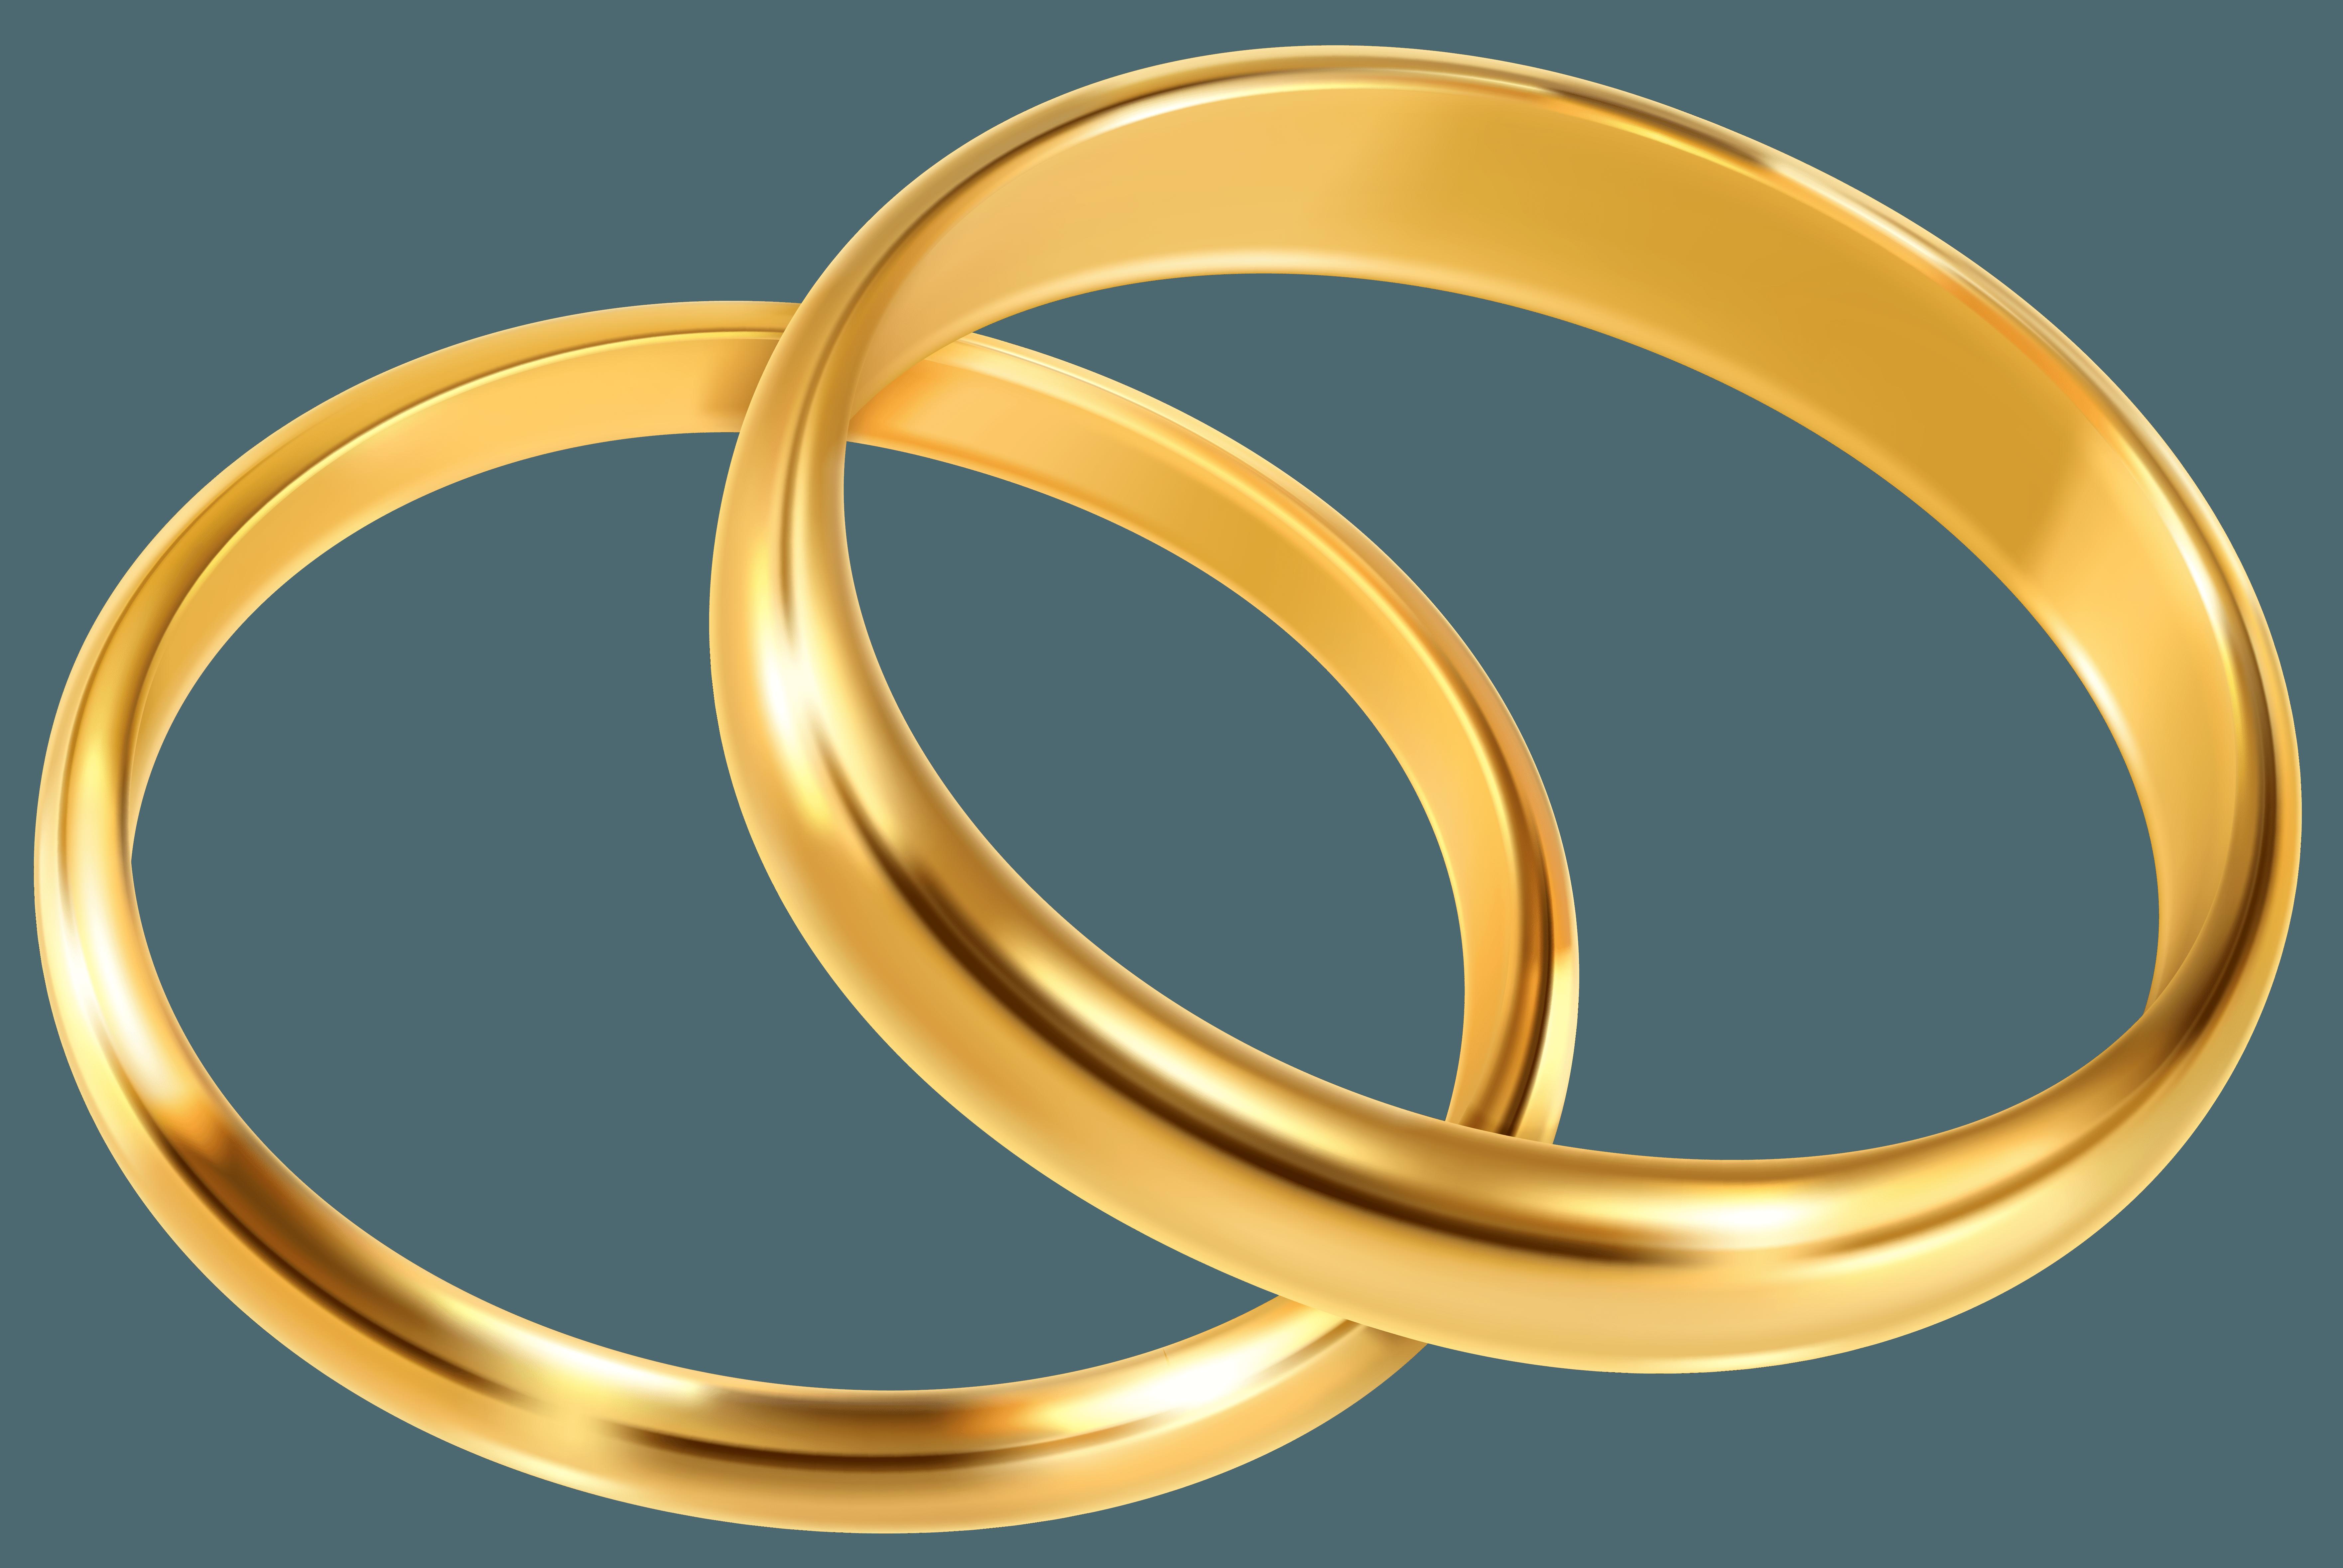 7047x4717 Wedding Ring Clip Art Gold Wedding Ring Clipart